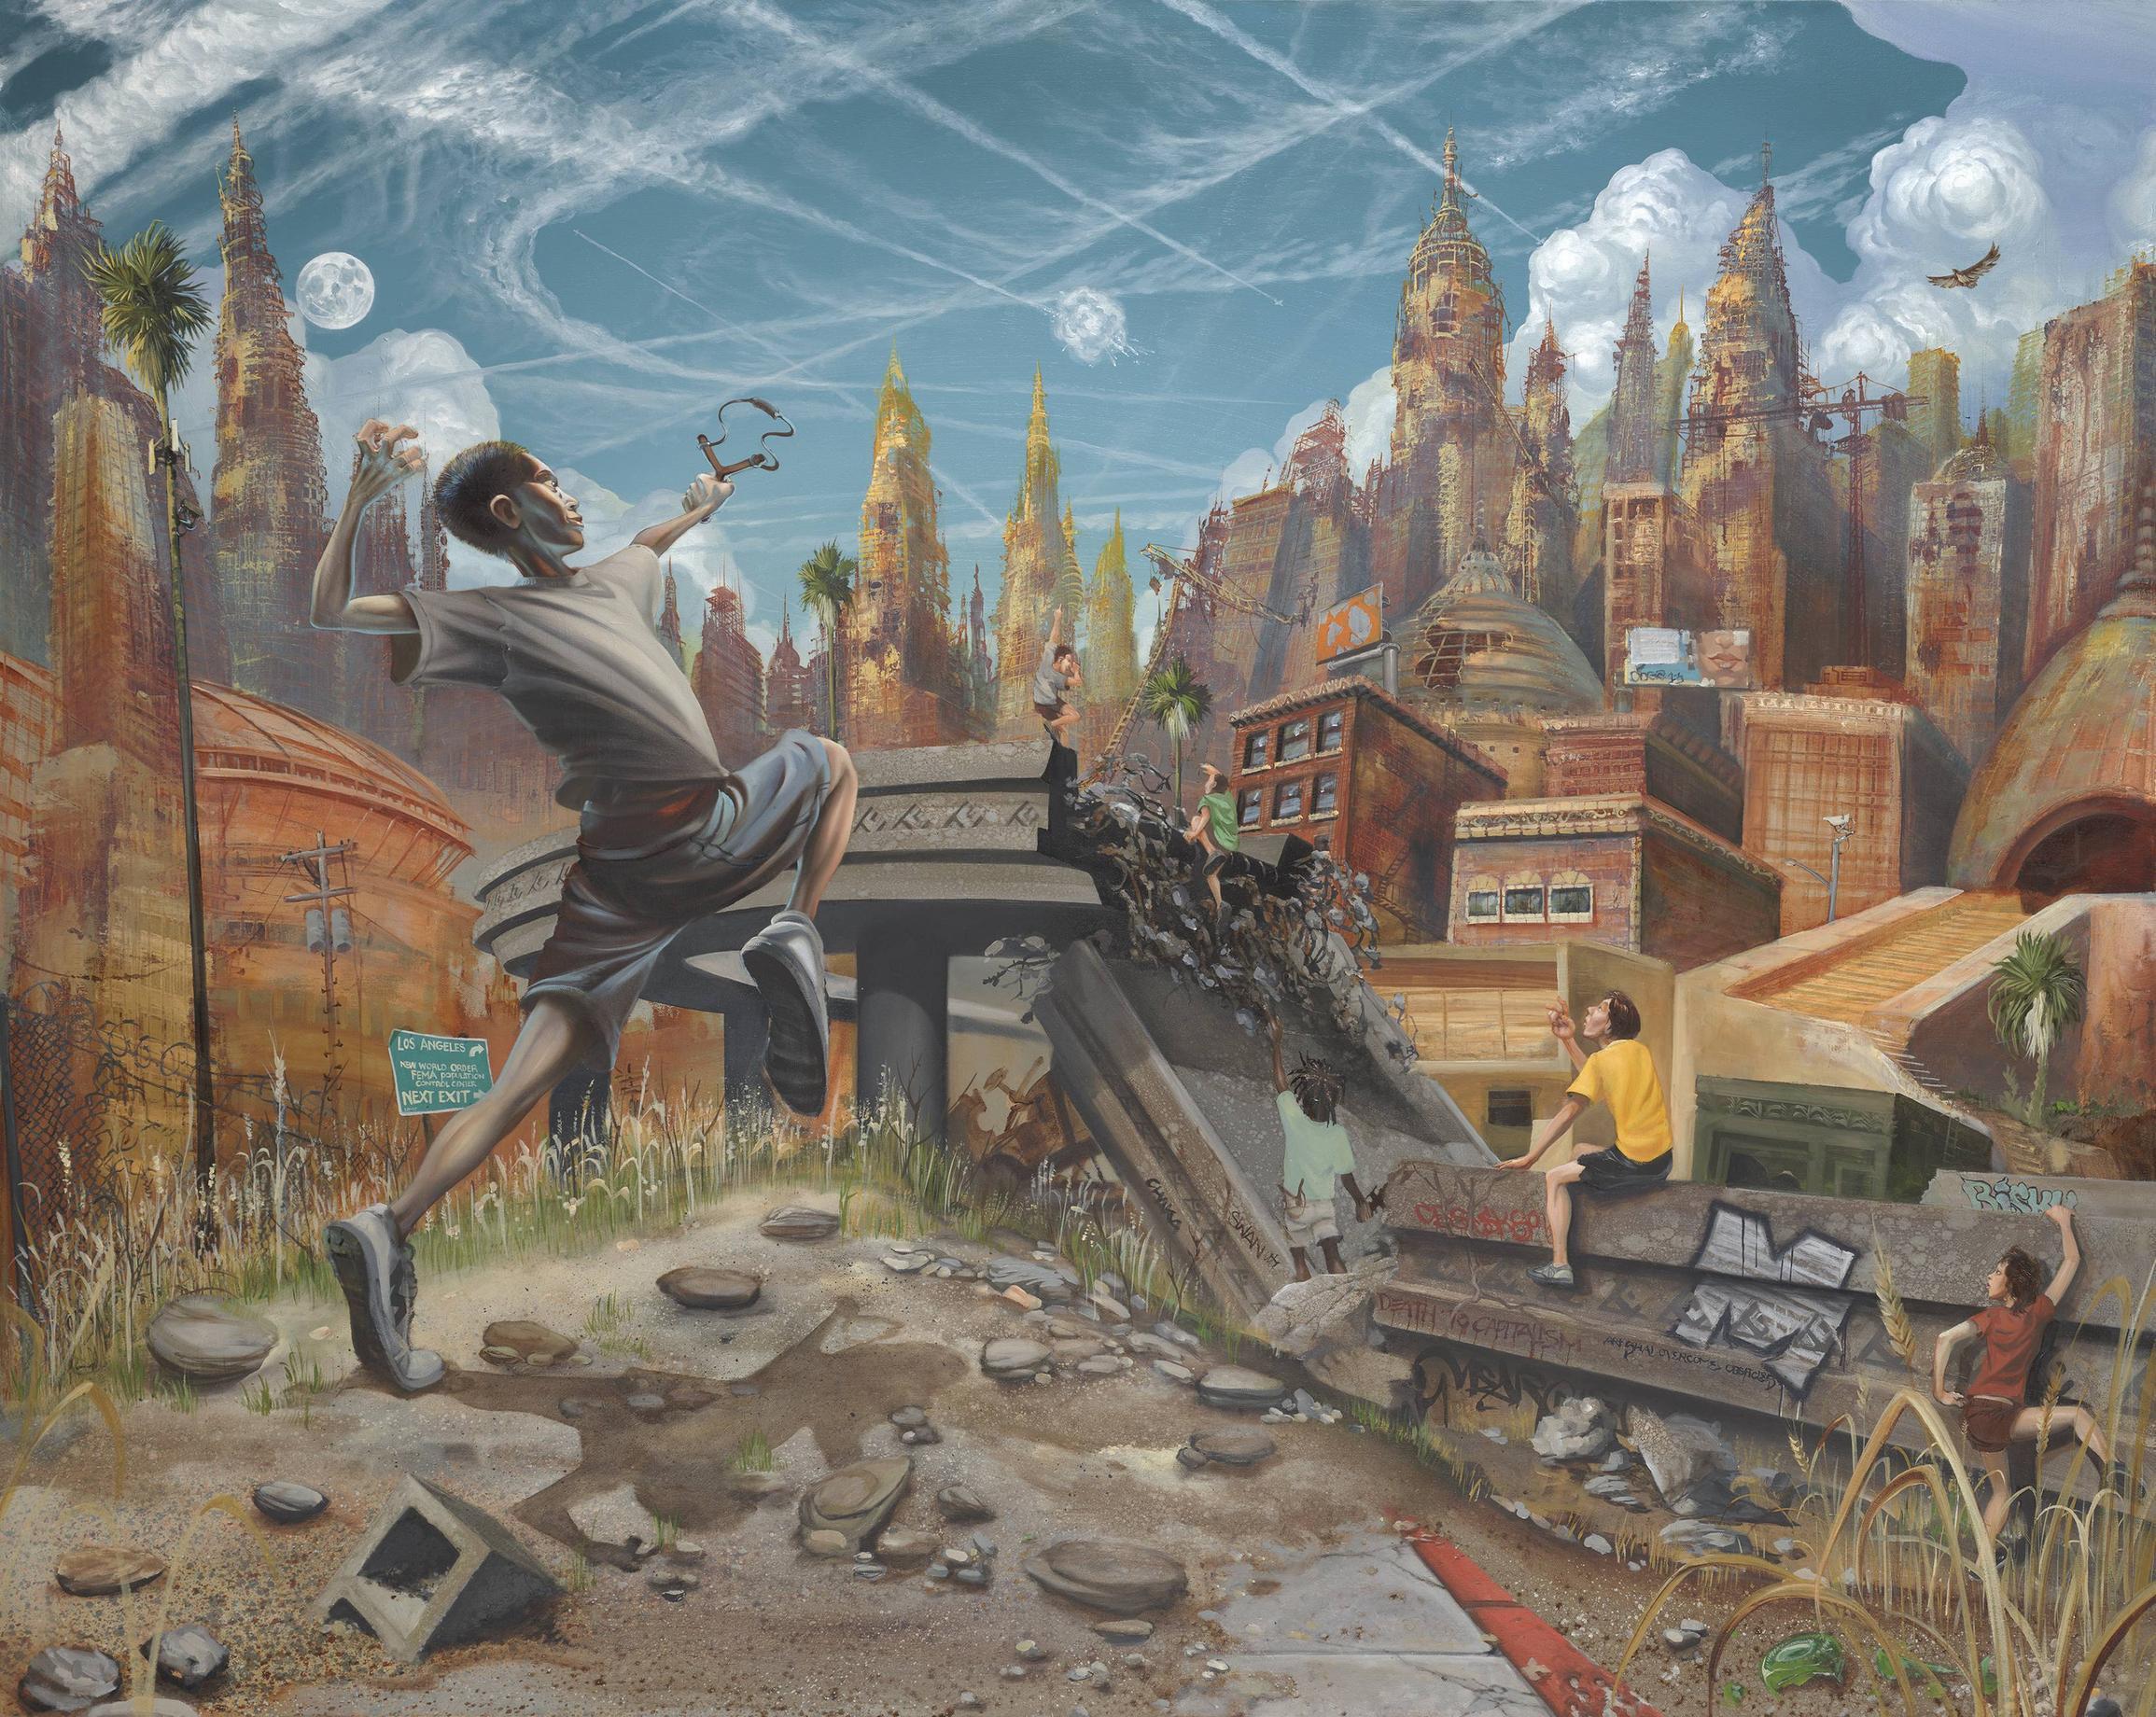 Freeport - David & Goliath 41/100